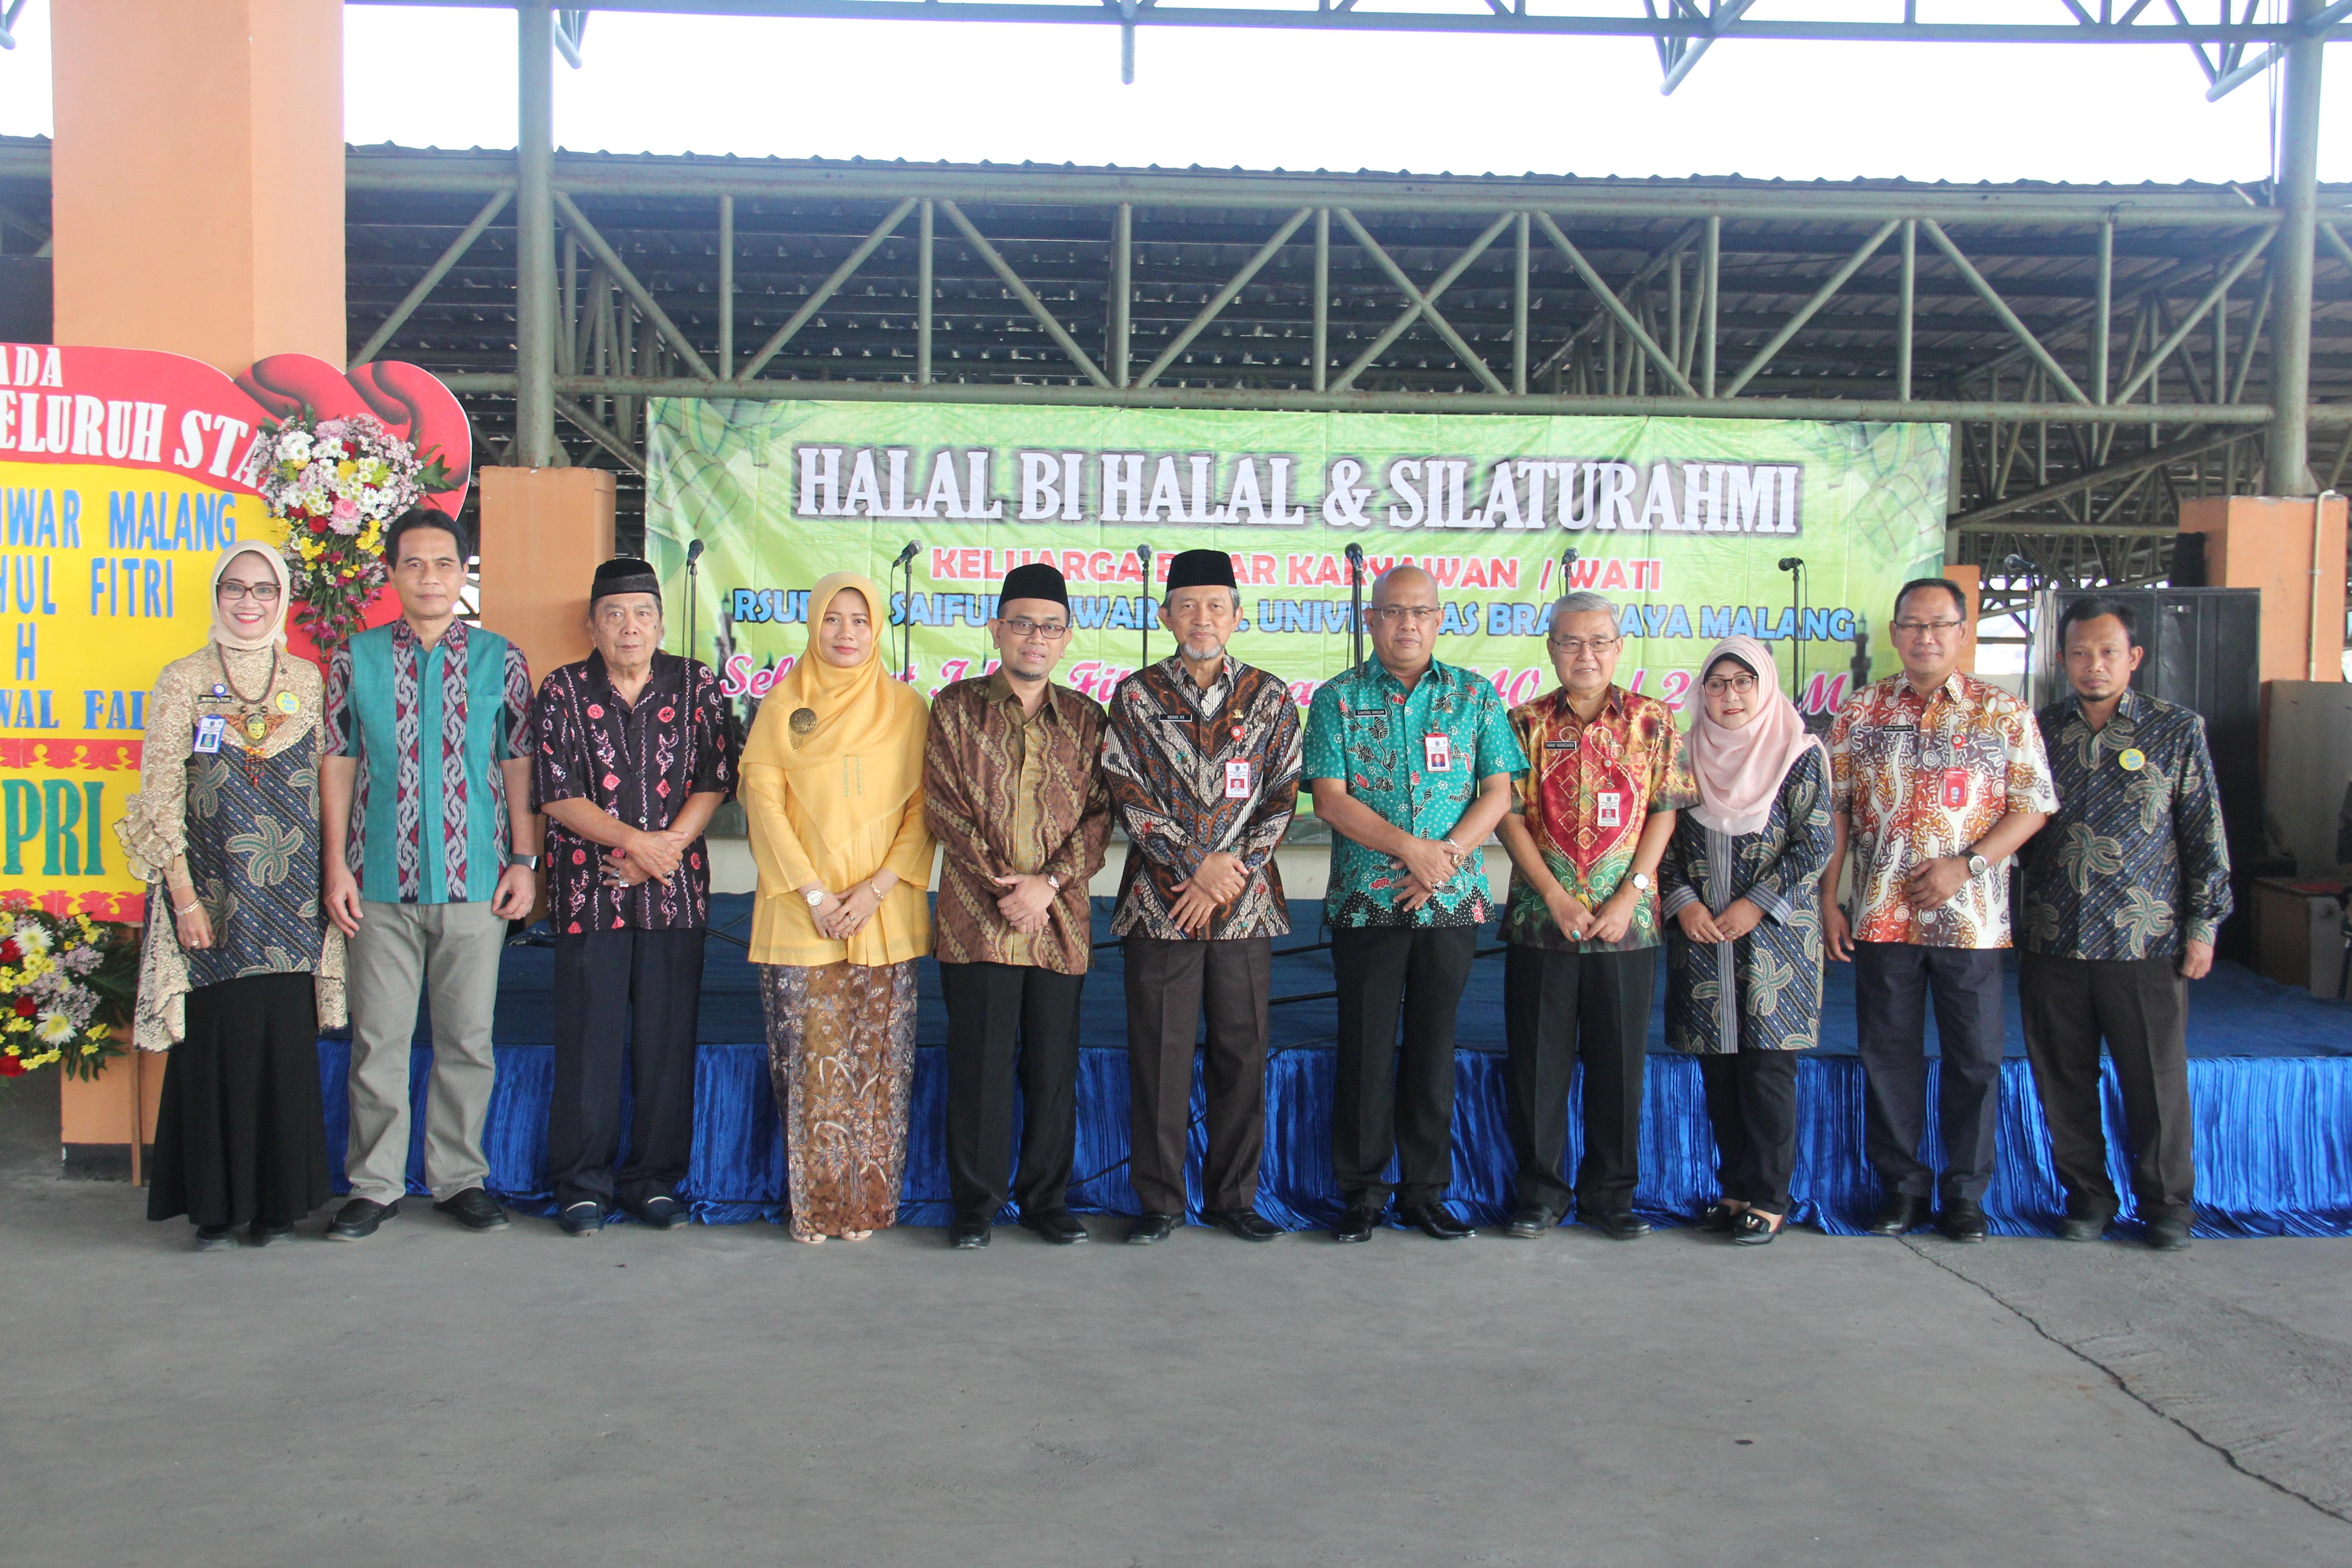 Halal bi halal & Silaturahmi keluarga besar RSUD Dr. Saiful Anwar Malang